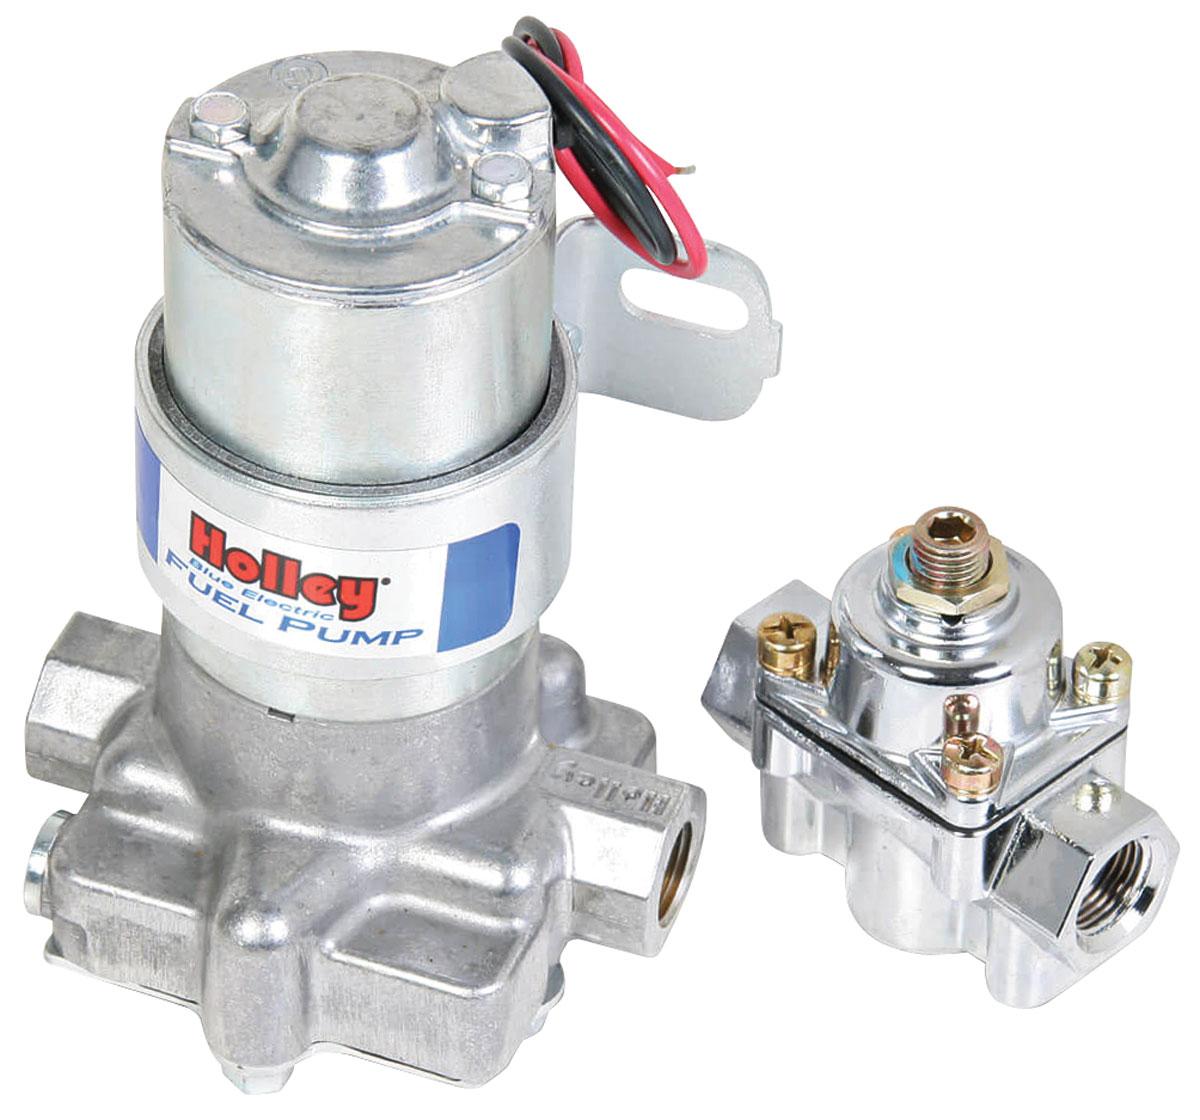 Photo of Fuel Pump, Electric blue, w/regulator